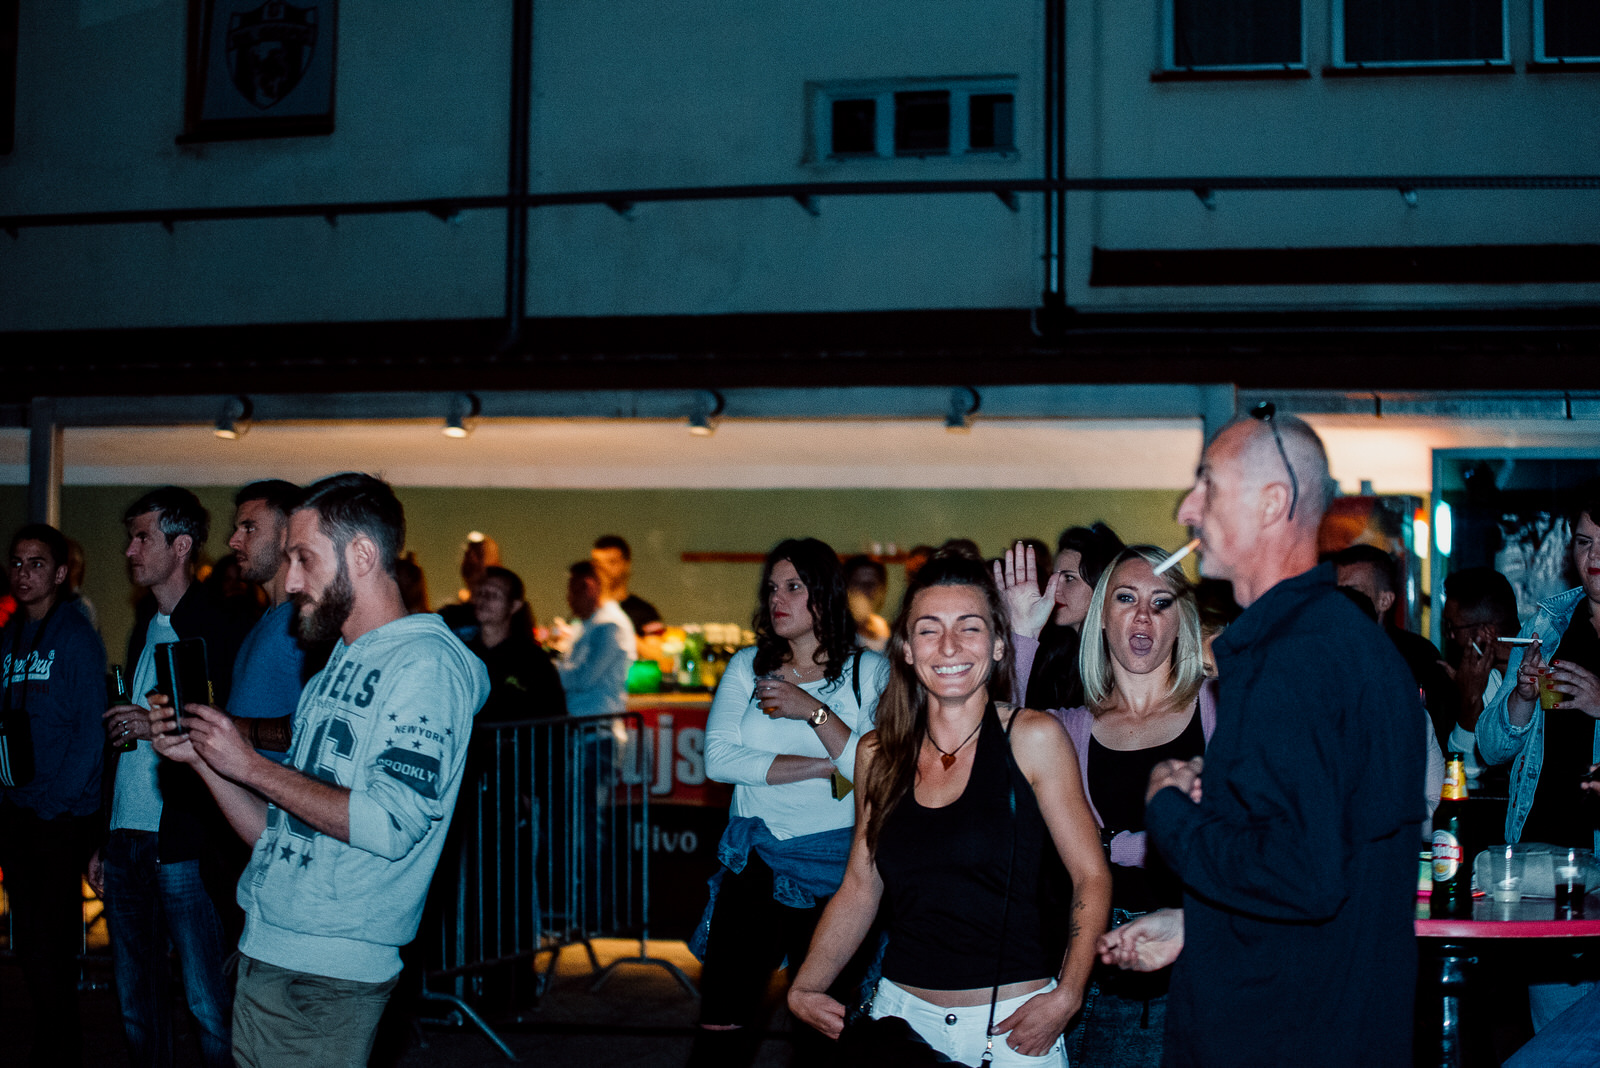 likaclub_grocks-2019_tbf-barbara-munjas-5